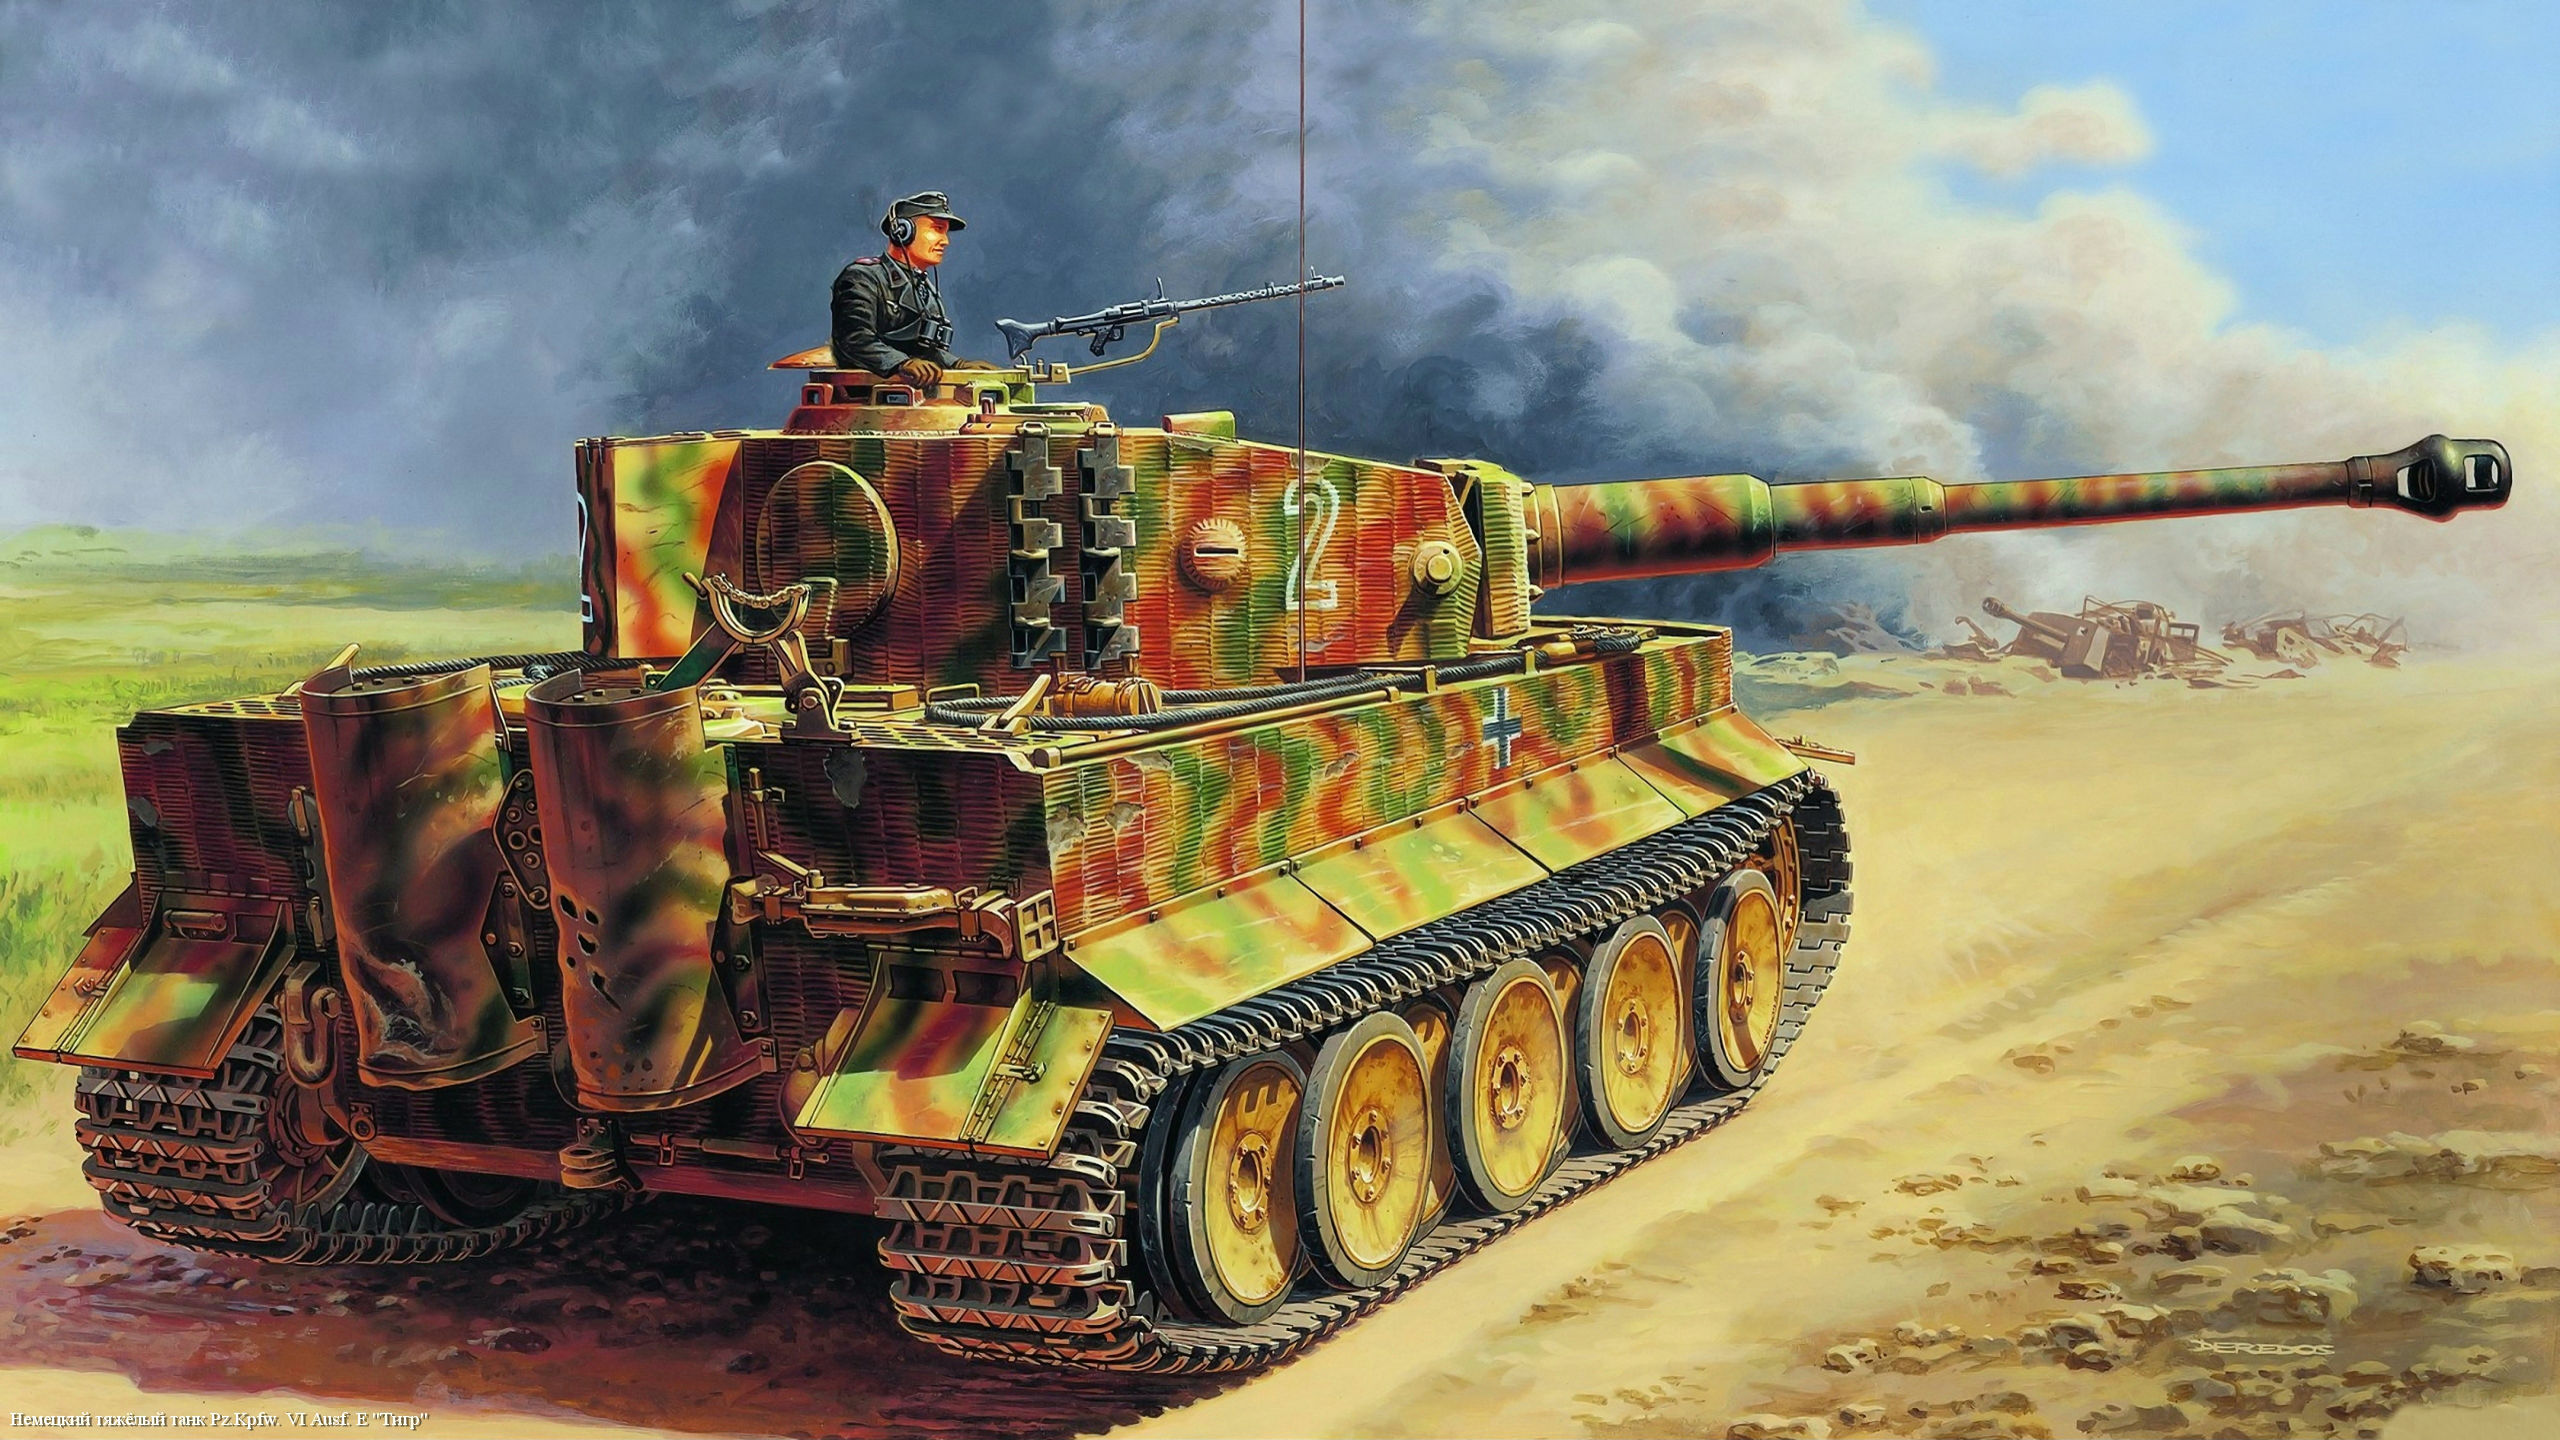 Tiger Tank Wallpaper Free HD 12515 - Amazing Wallpaperz